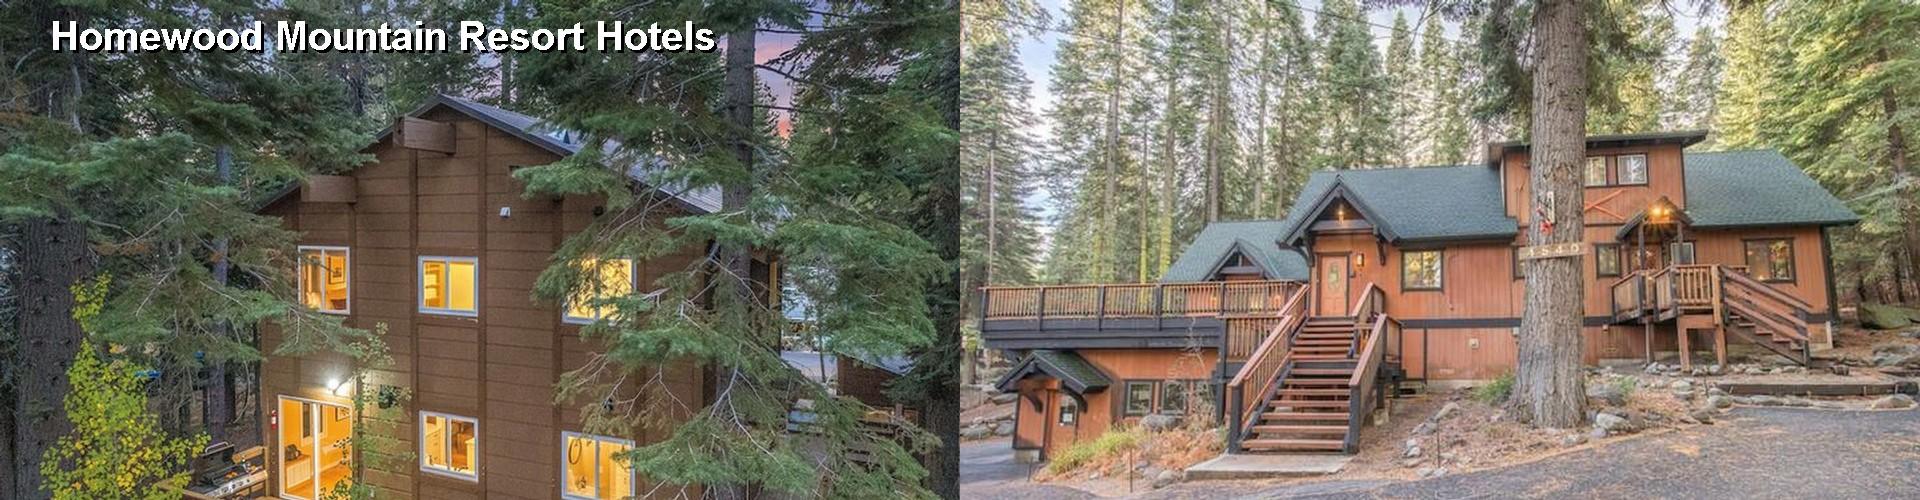 Best Kitchen Gallery: 44 Hotels Near Homewood Mountain Resort In Lake Tahoe Ca of Hotels Near Heavenly Ski Resort  on rachelxblog.com